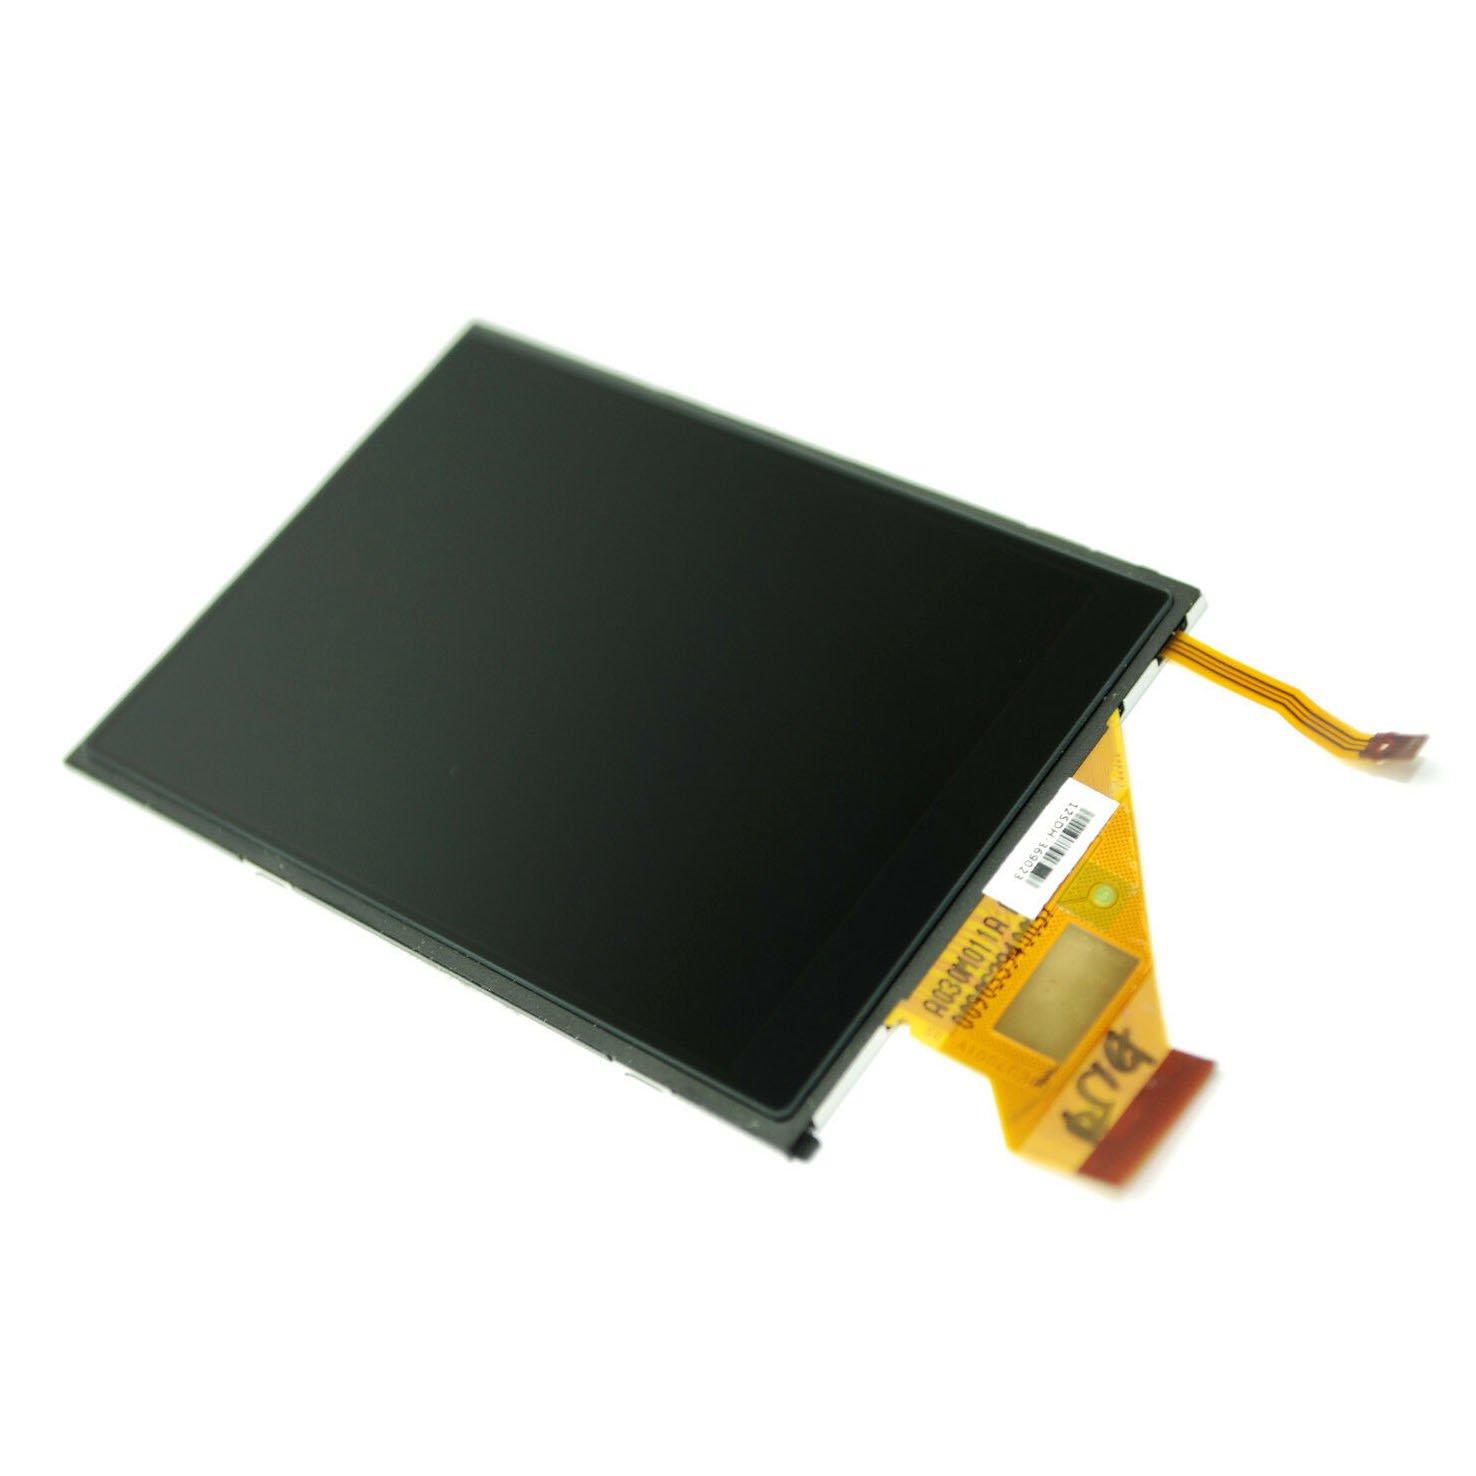 Genuine Canon Powershot SX610 HS LCD Screen Display - Repair Parts